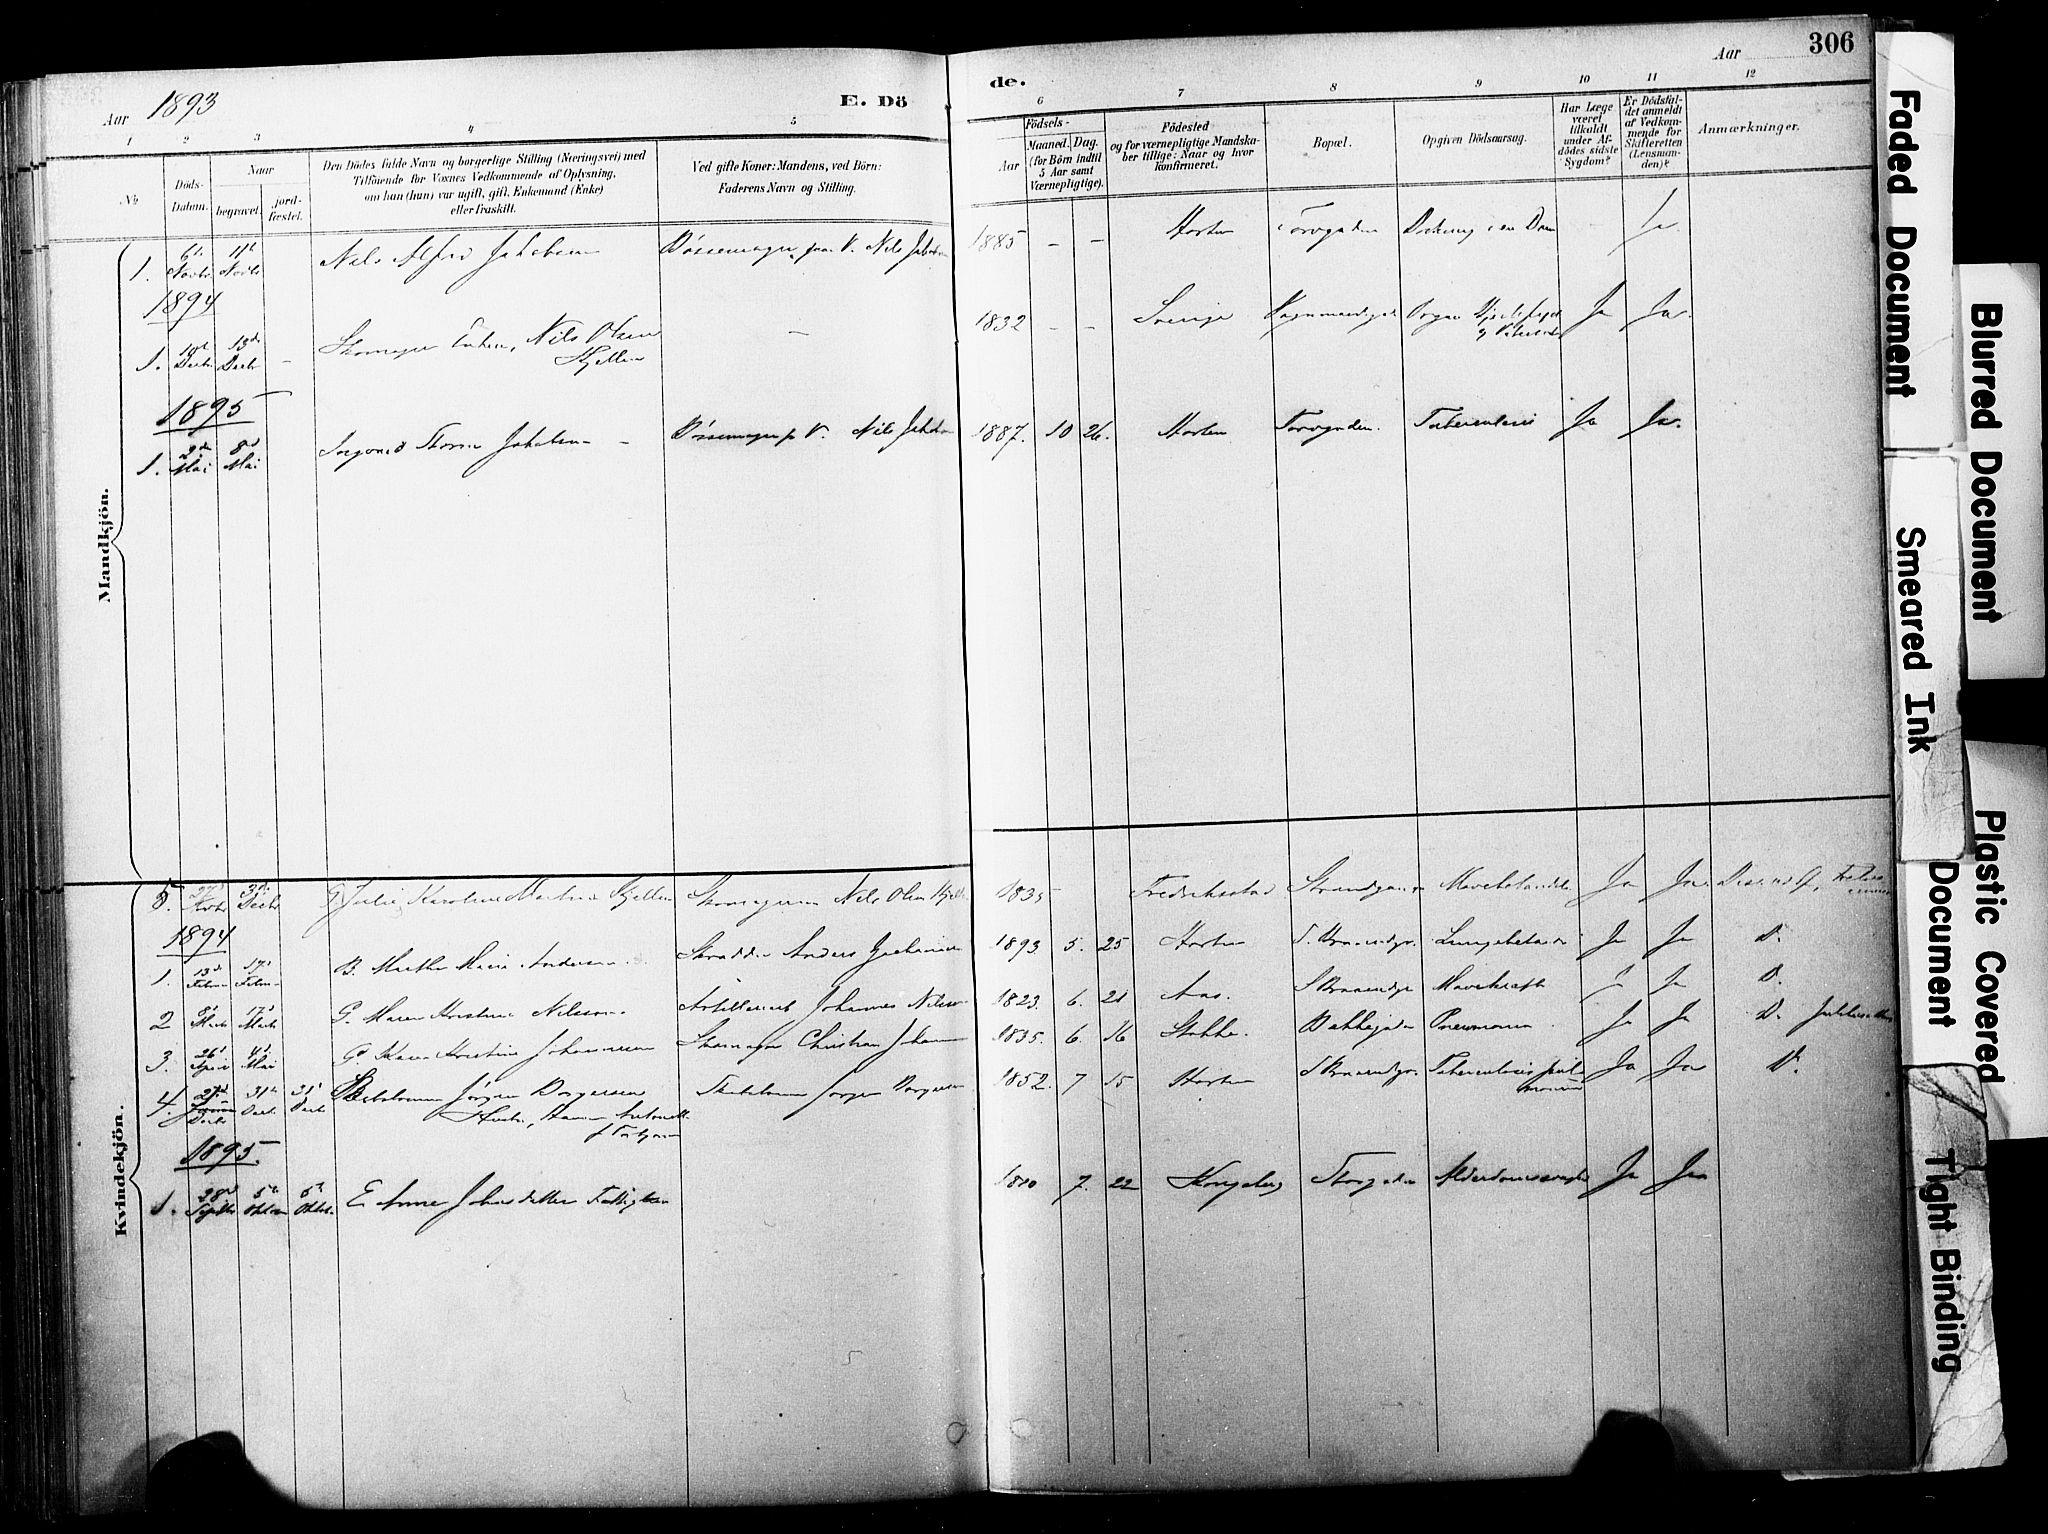 SAKO, Horten kirkebøker, F/Fa/L0004: Parish register (official) no. 4, 1888-1895, p. 306